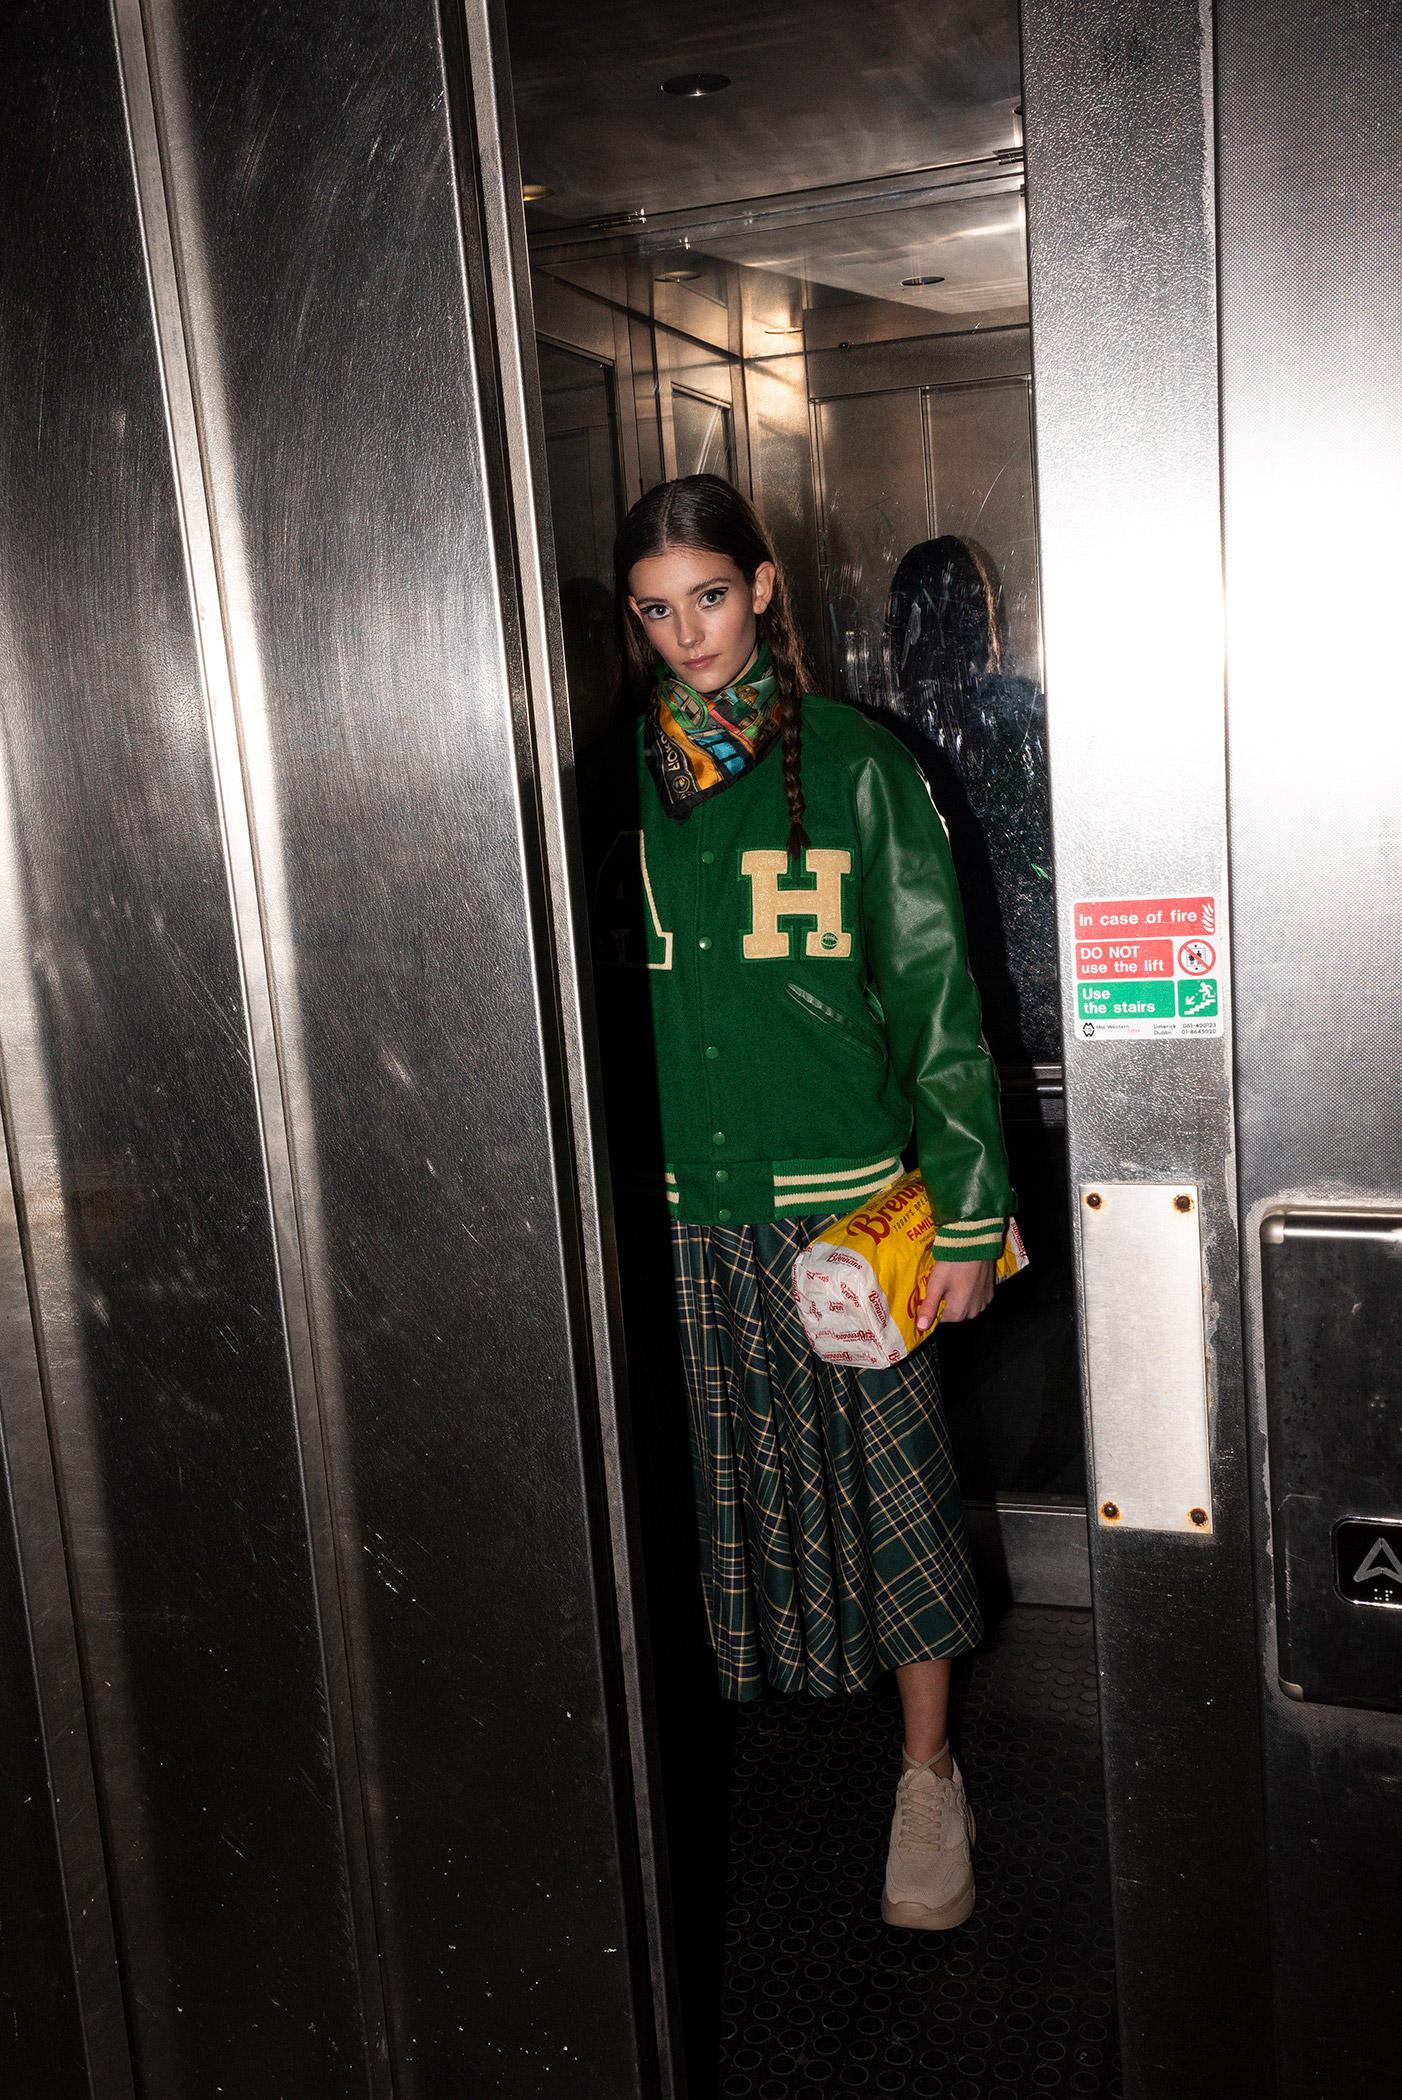 Final-look-skirt-and-baseball-jacket-in-elevator-5928.jpg